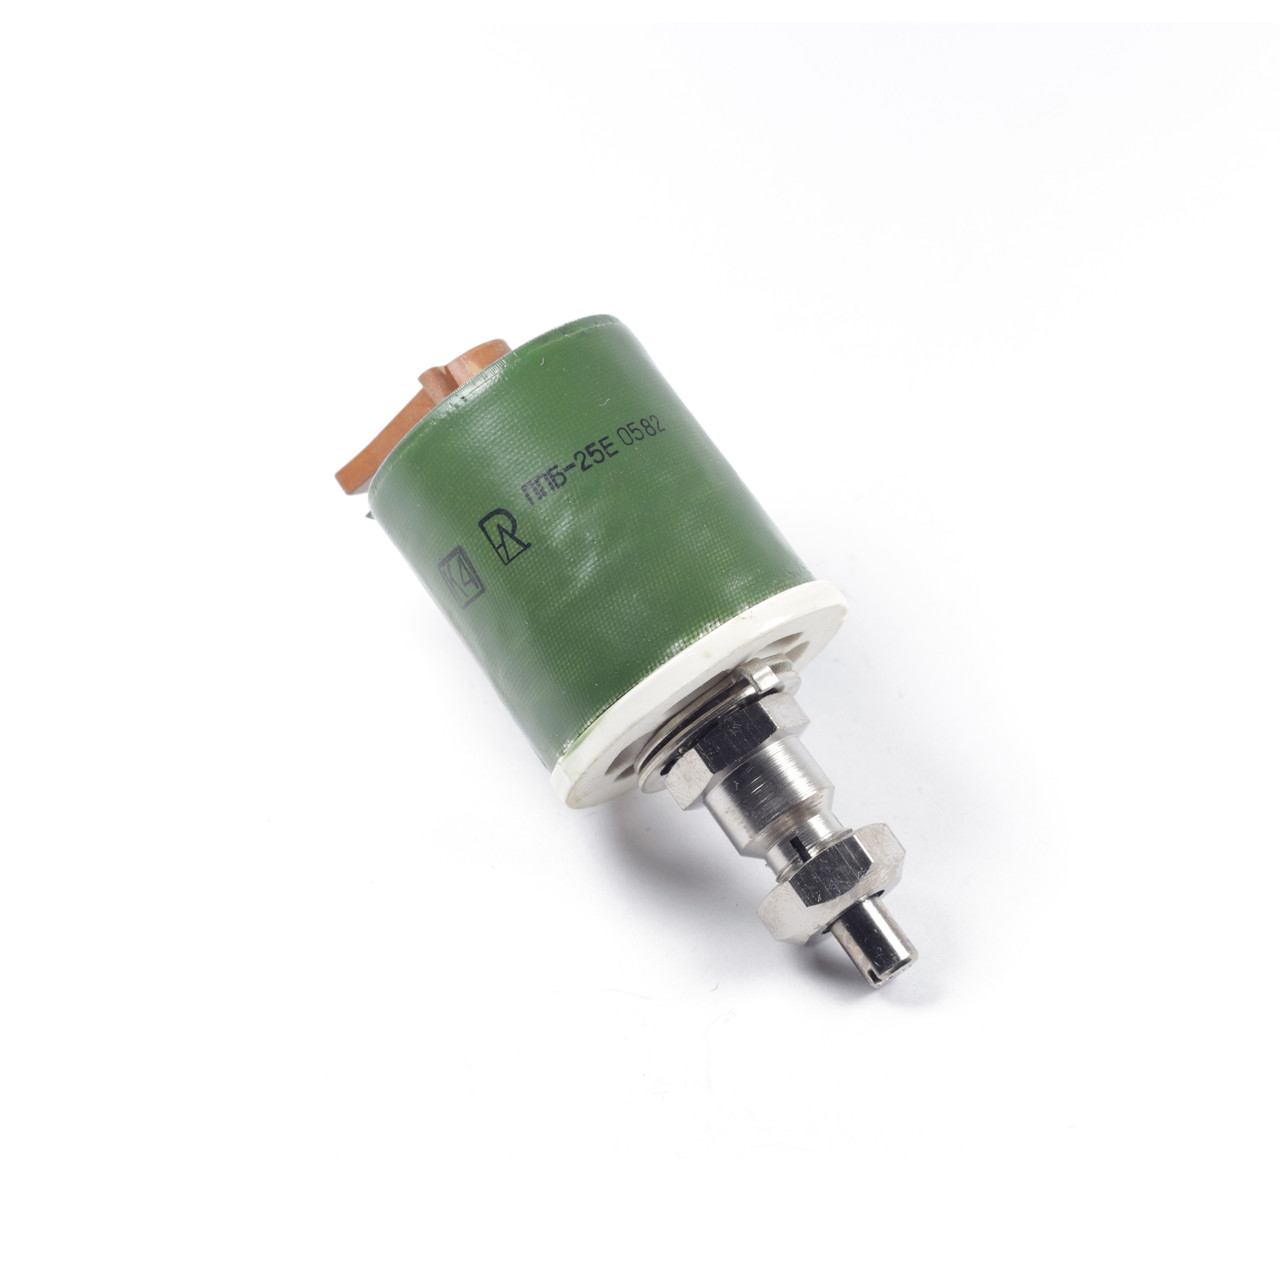 Резистор ППБ-25Е-25Вт 10 Ом